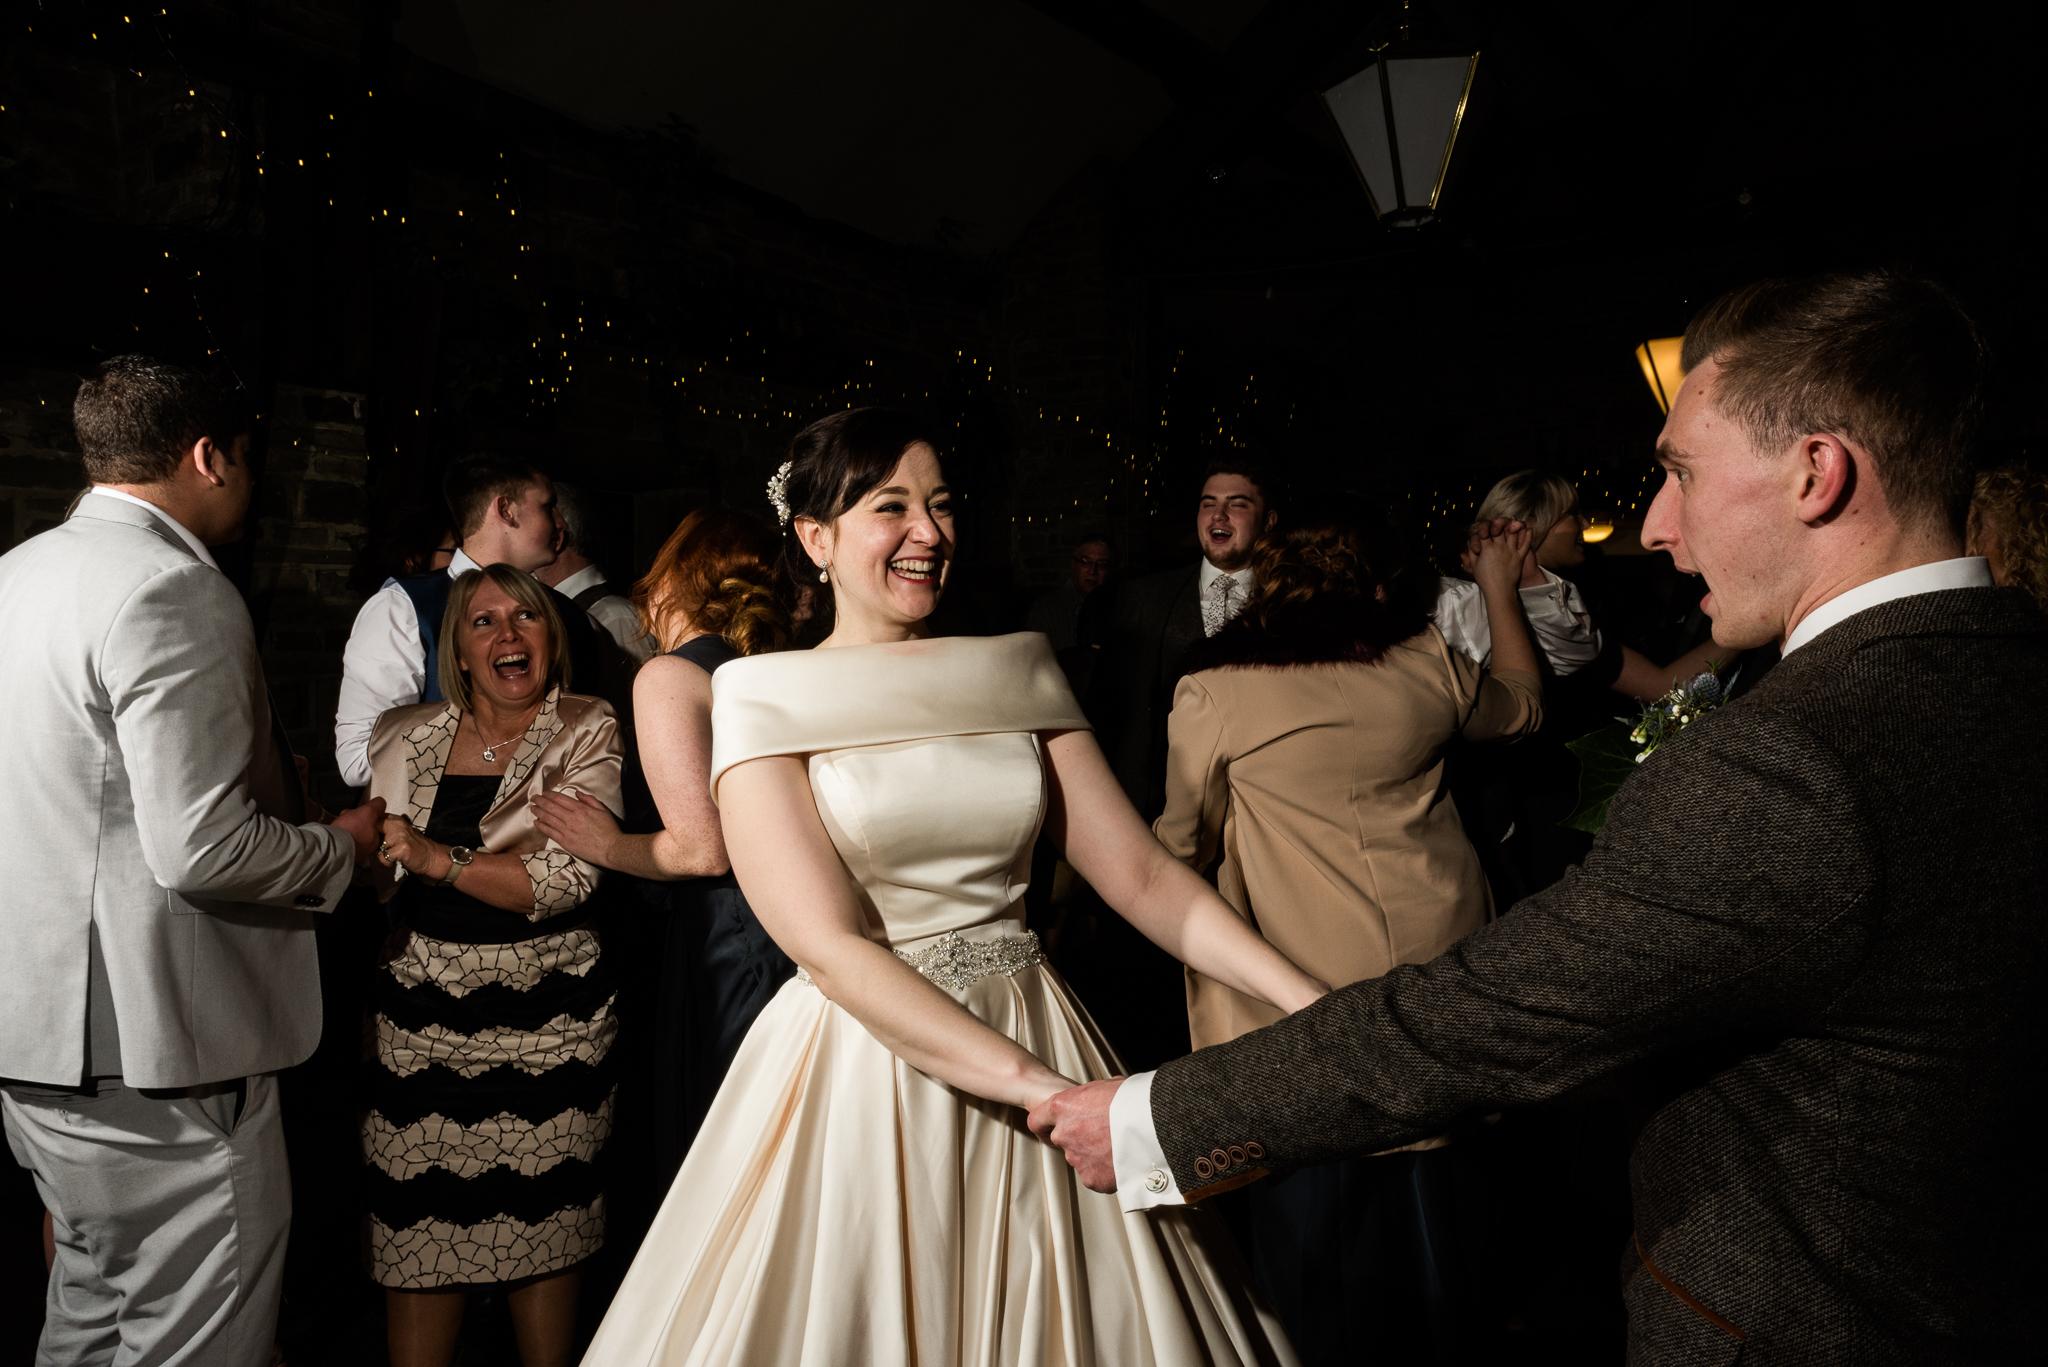 Yorkshire Wedding Photography Spring Wedding Cubley Hall Rustic Barn-46.jpg